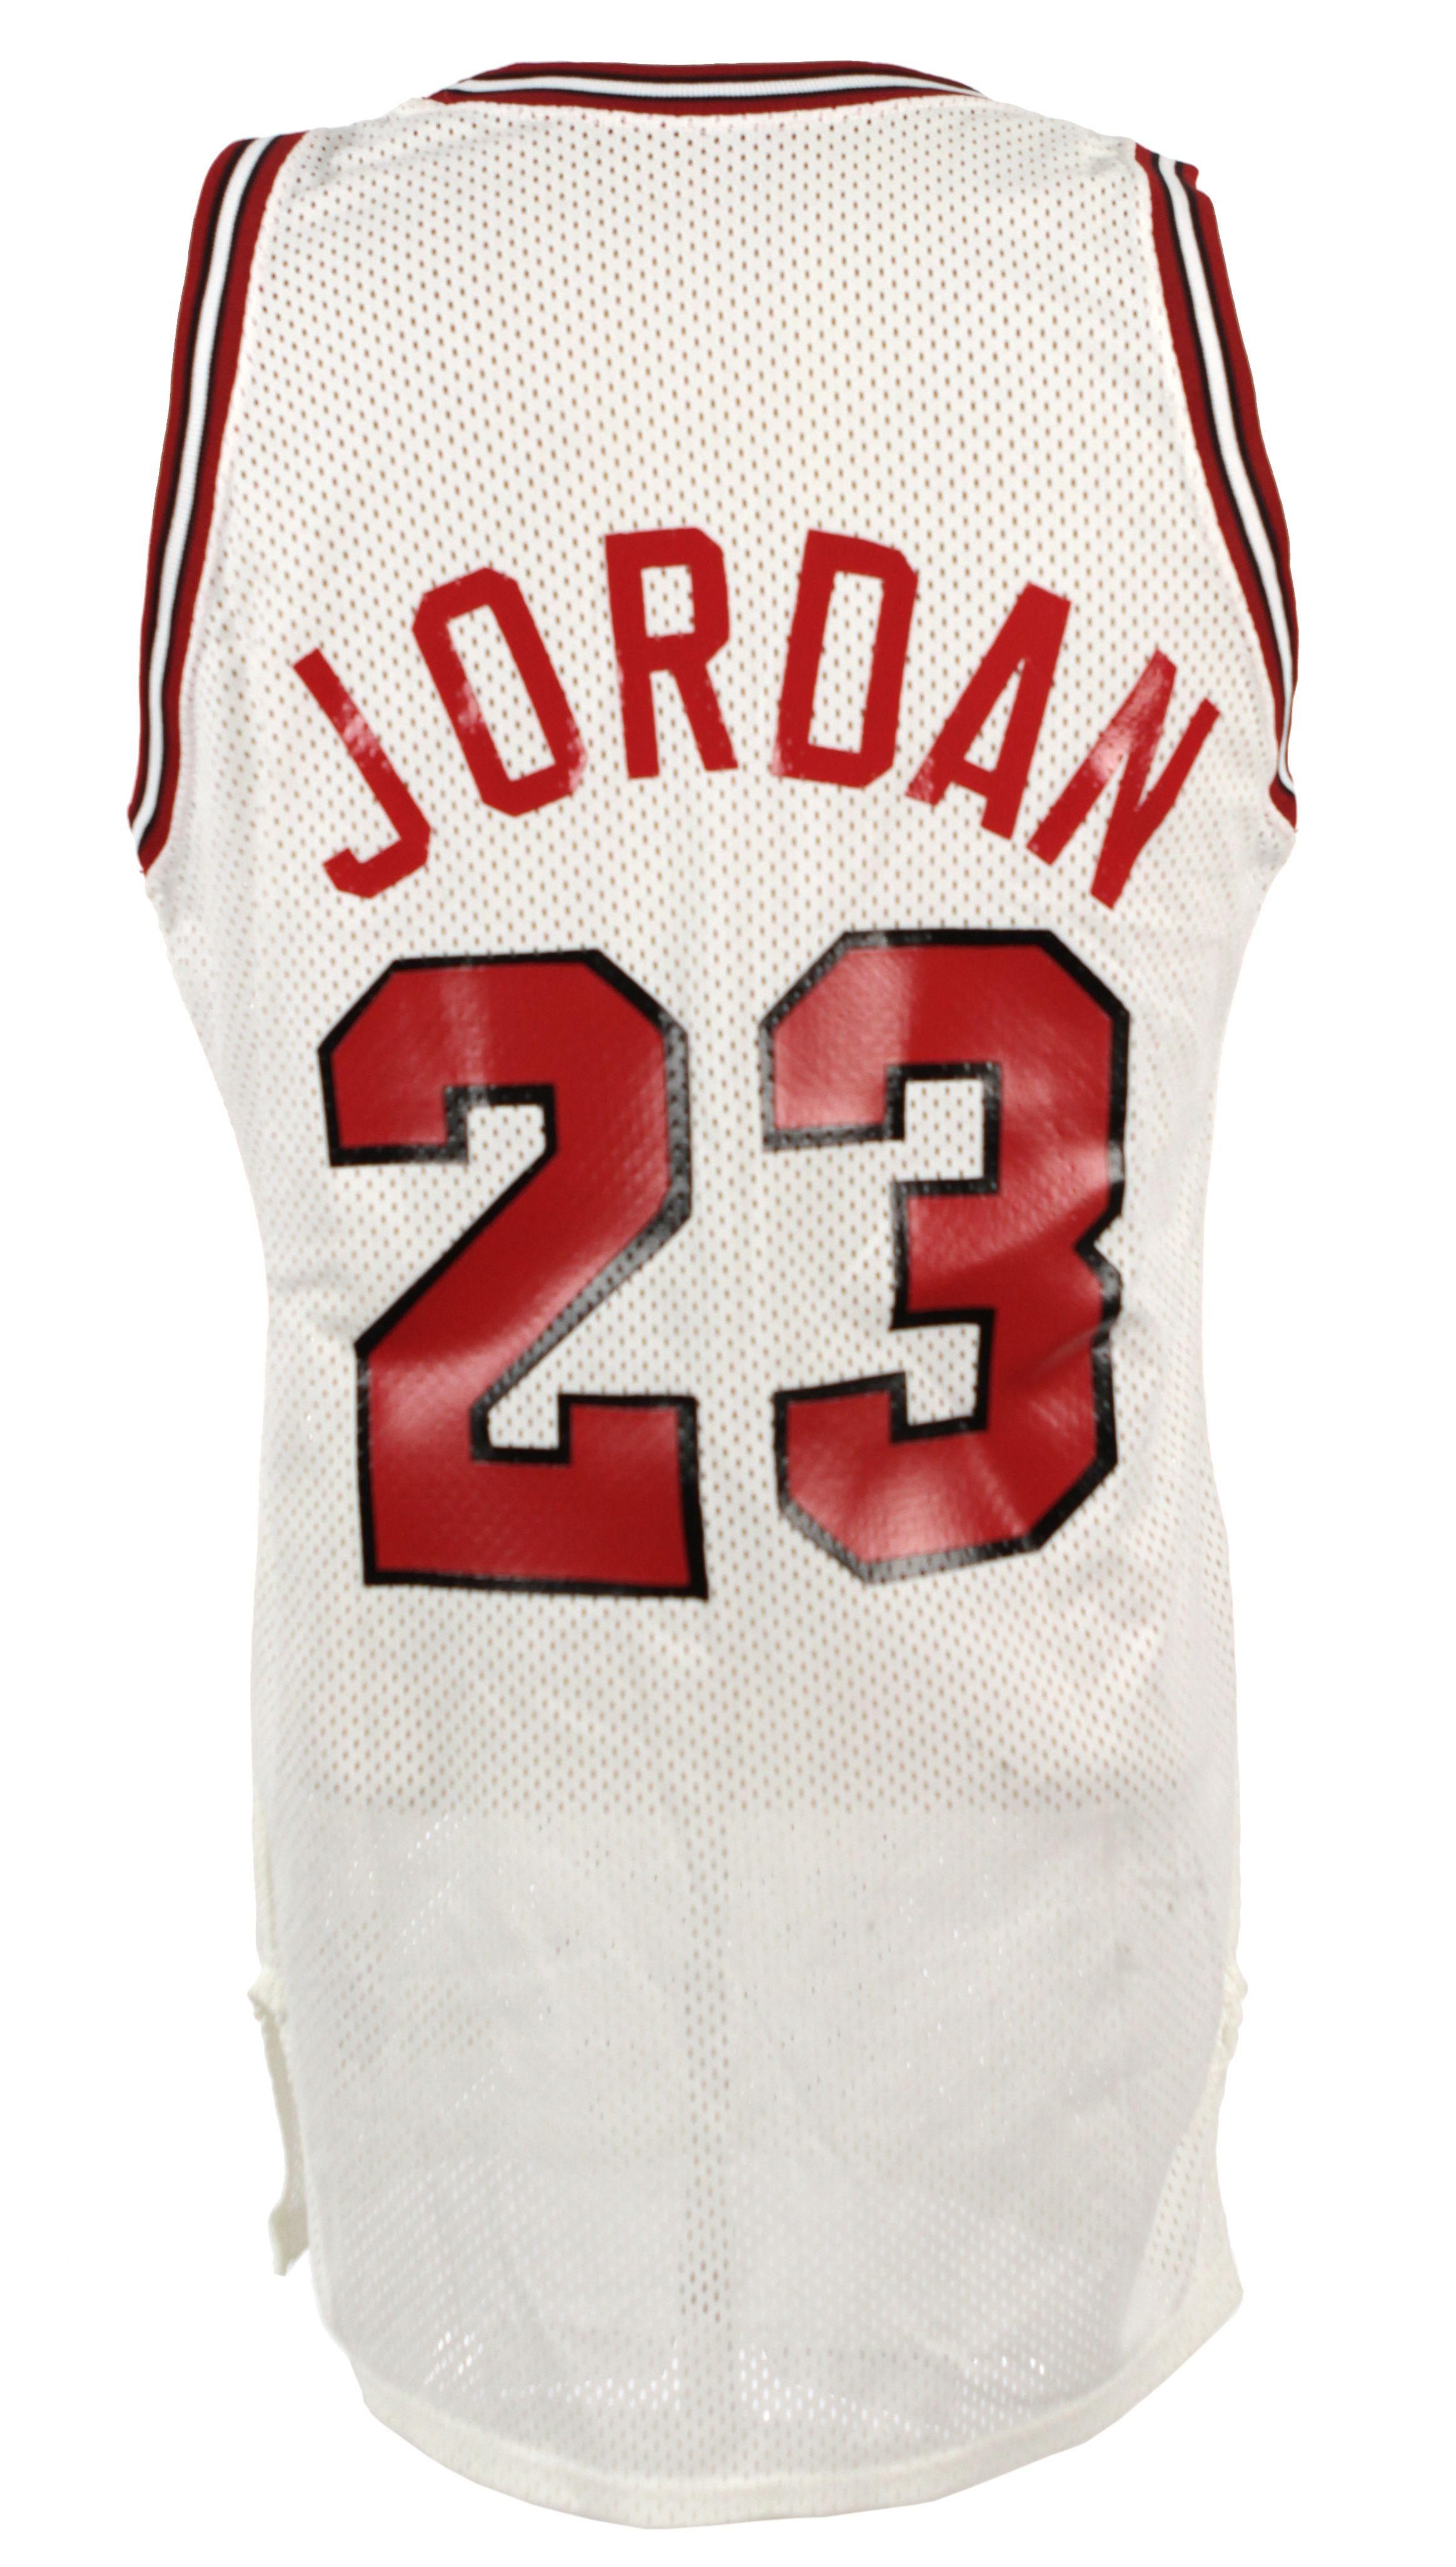 cheaper 33821 74e44 Determining Use on Michael Jordan Game-Worn Jersey ...